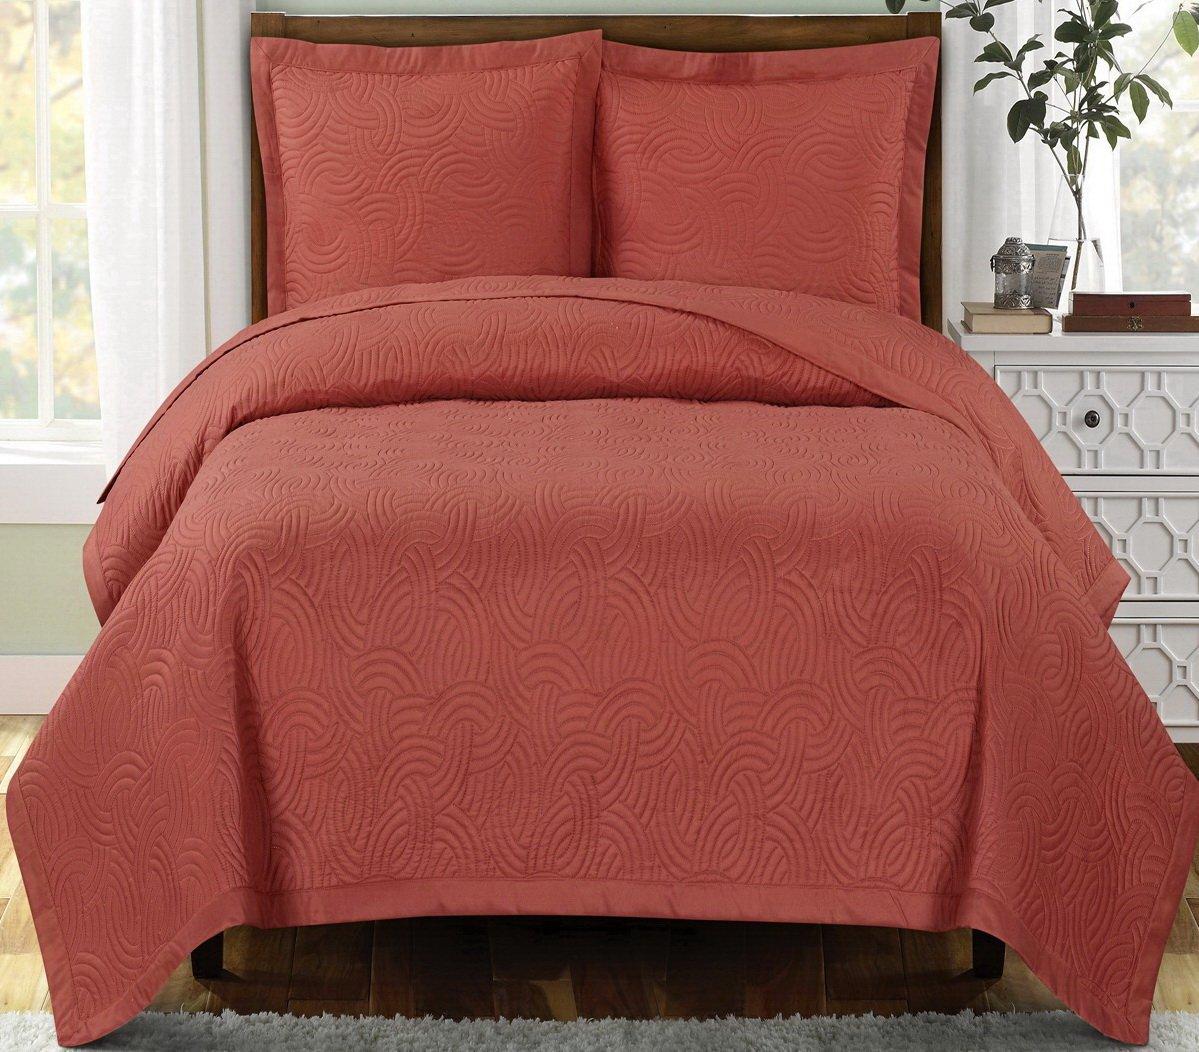 Modern Coral Coverlet Quilt and Shams Set King/Cal King Lightweight Reversible Wrinkle Free Bedding Oversized